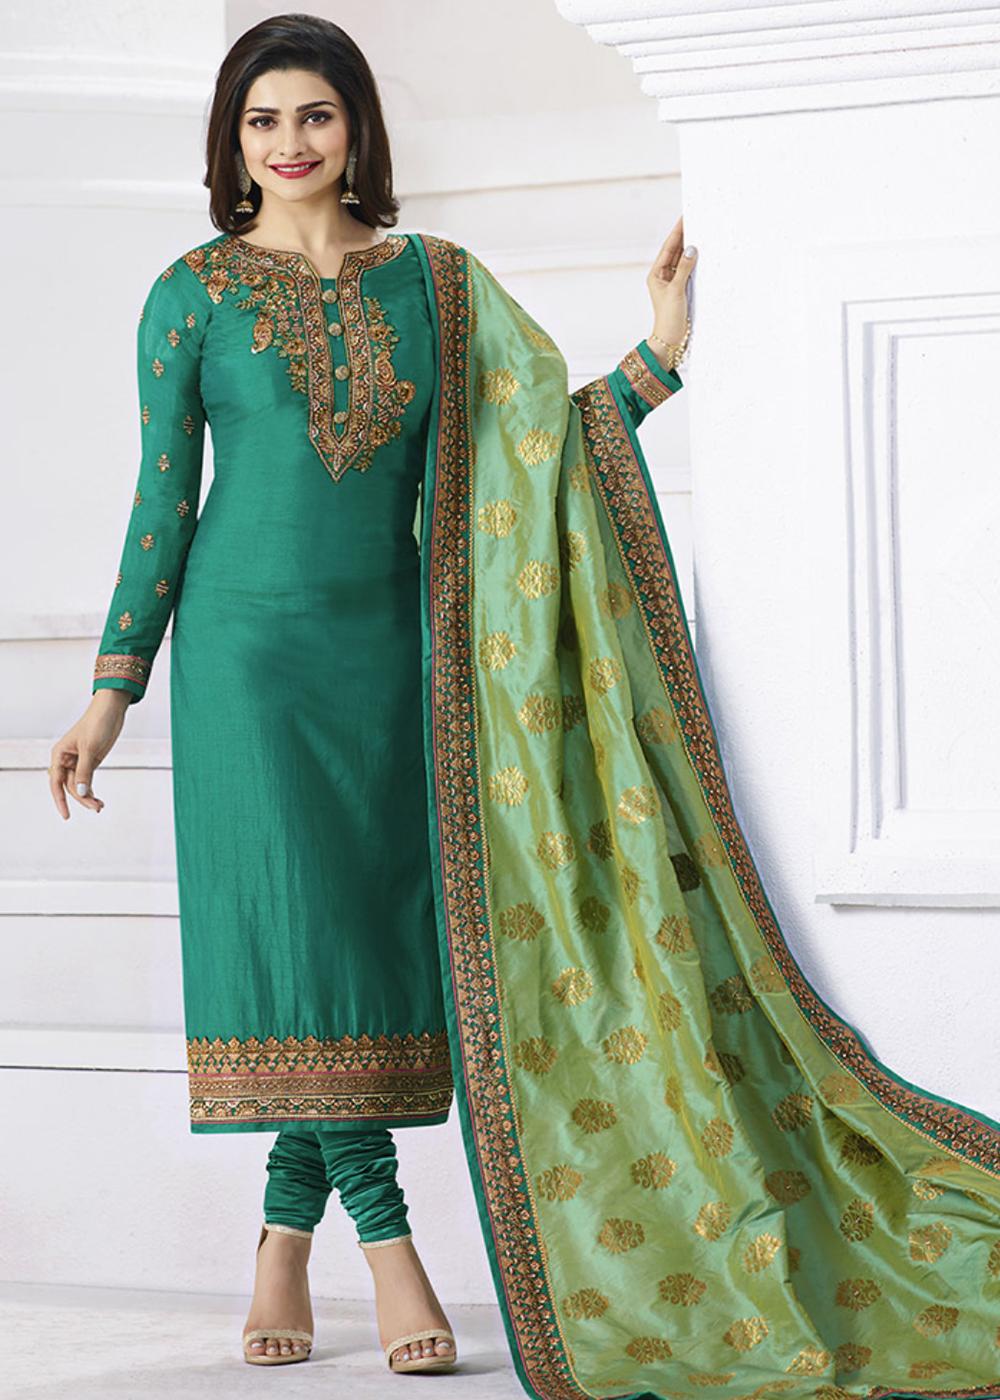 fee2f263d0 Prachi Desai Teal Green Art Silk Straight Cut Salwar Suit in 2019 ...